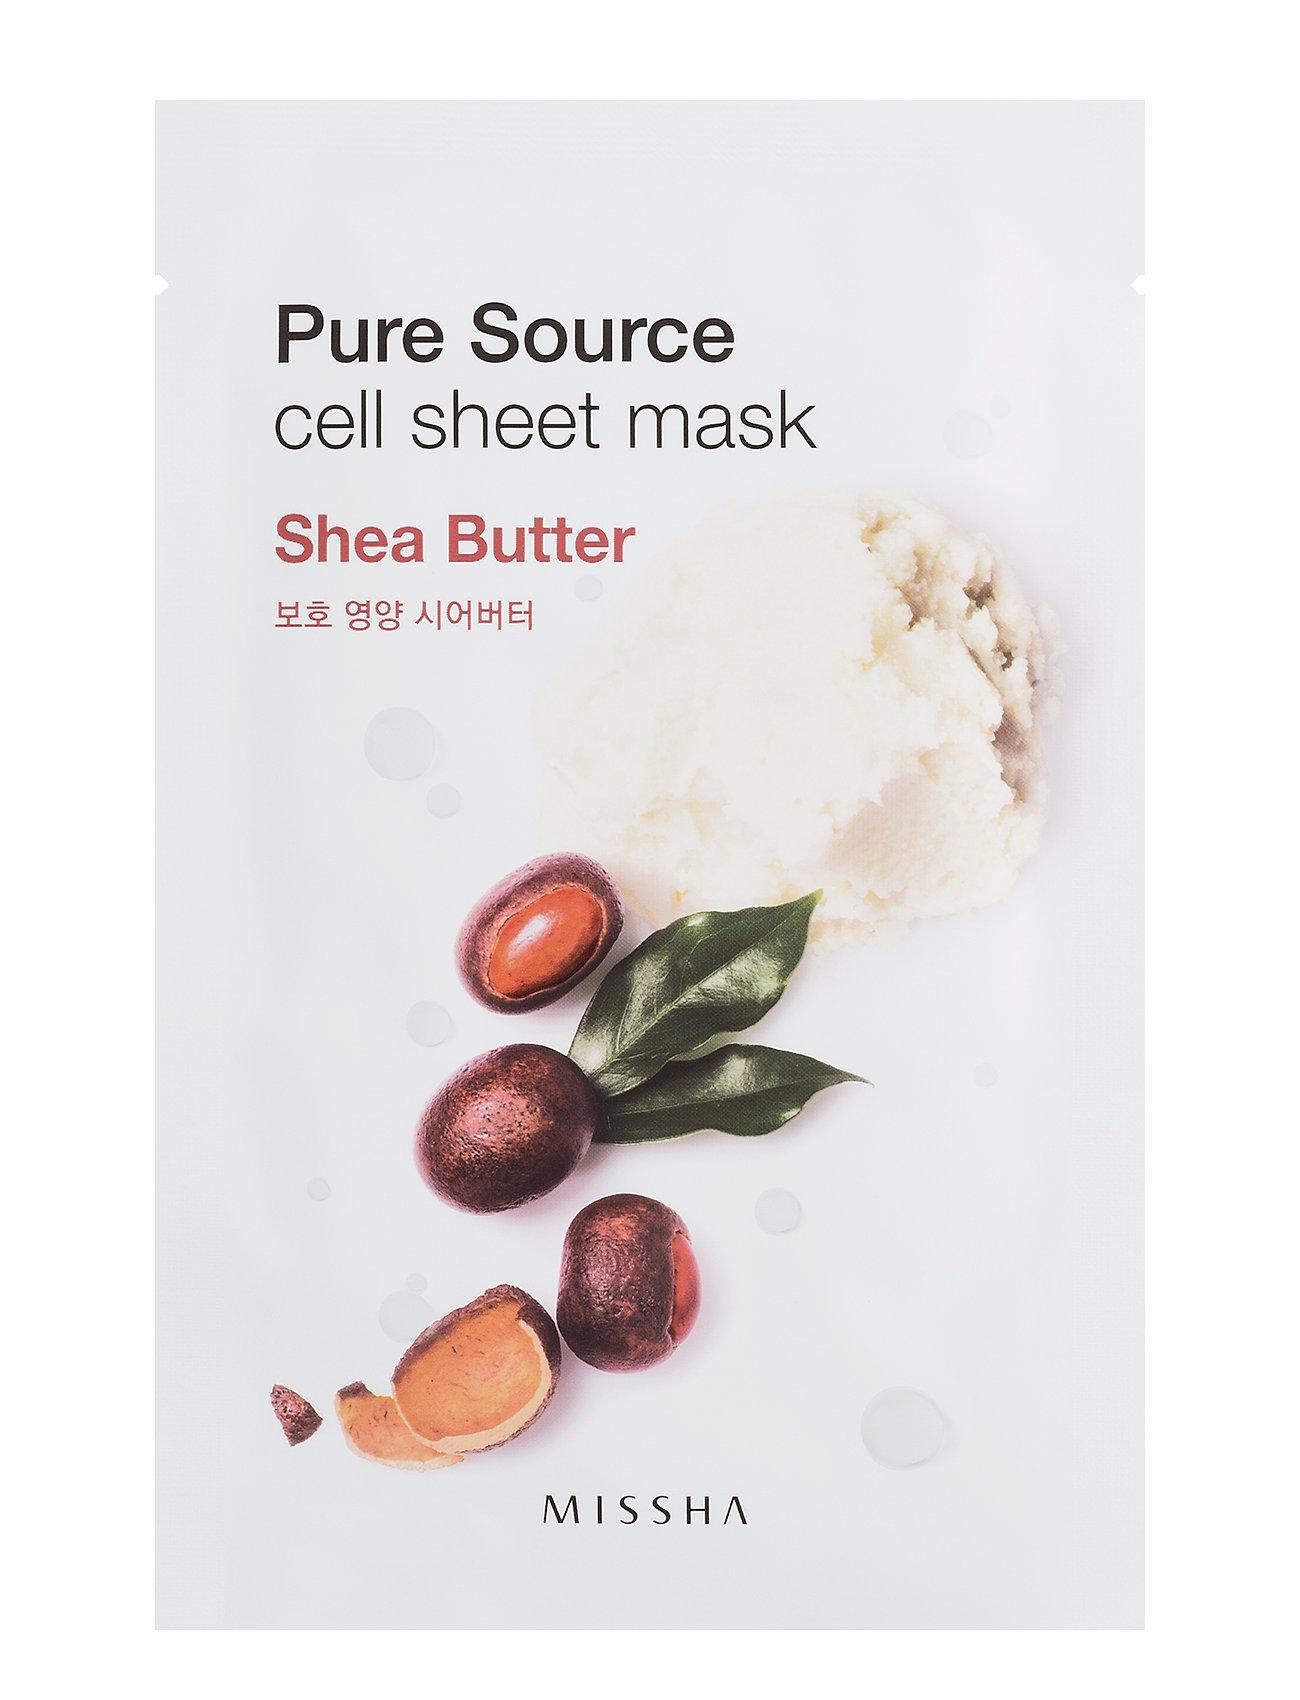 Missha Pure Source Cell Sheet Mask (Shea Butter) - Missha